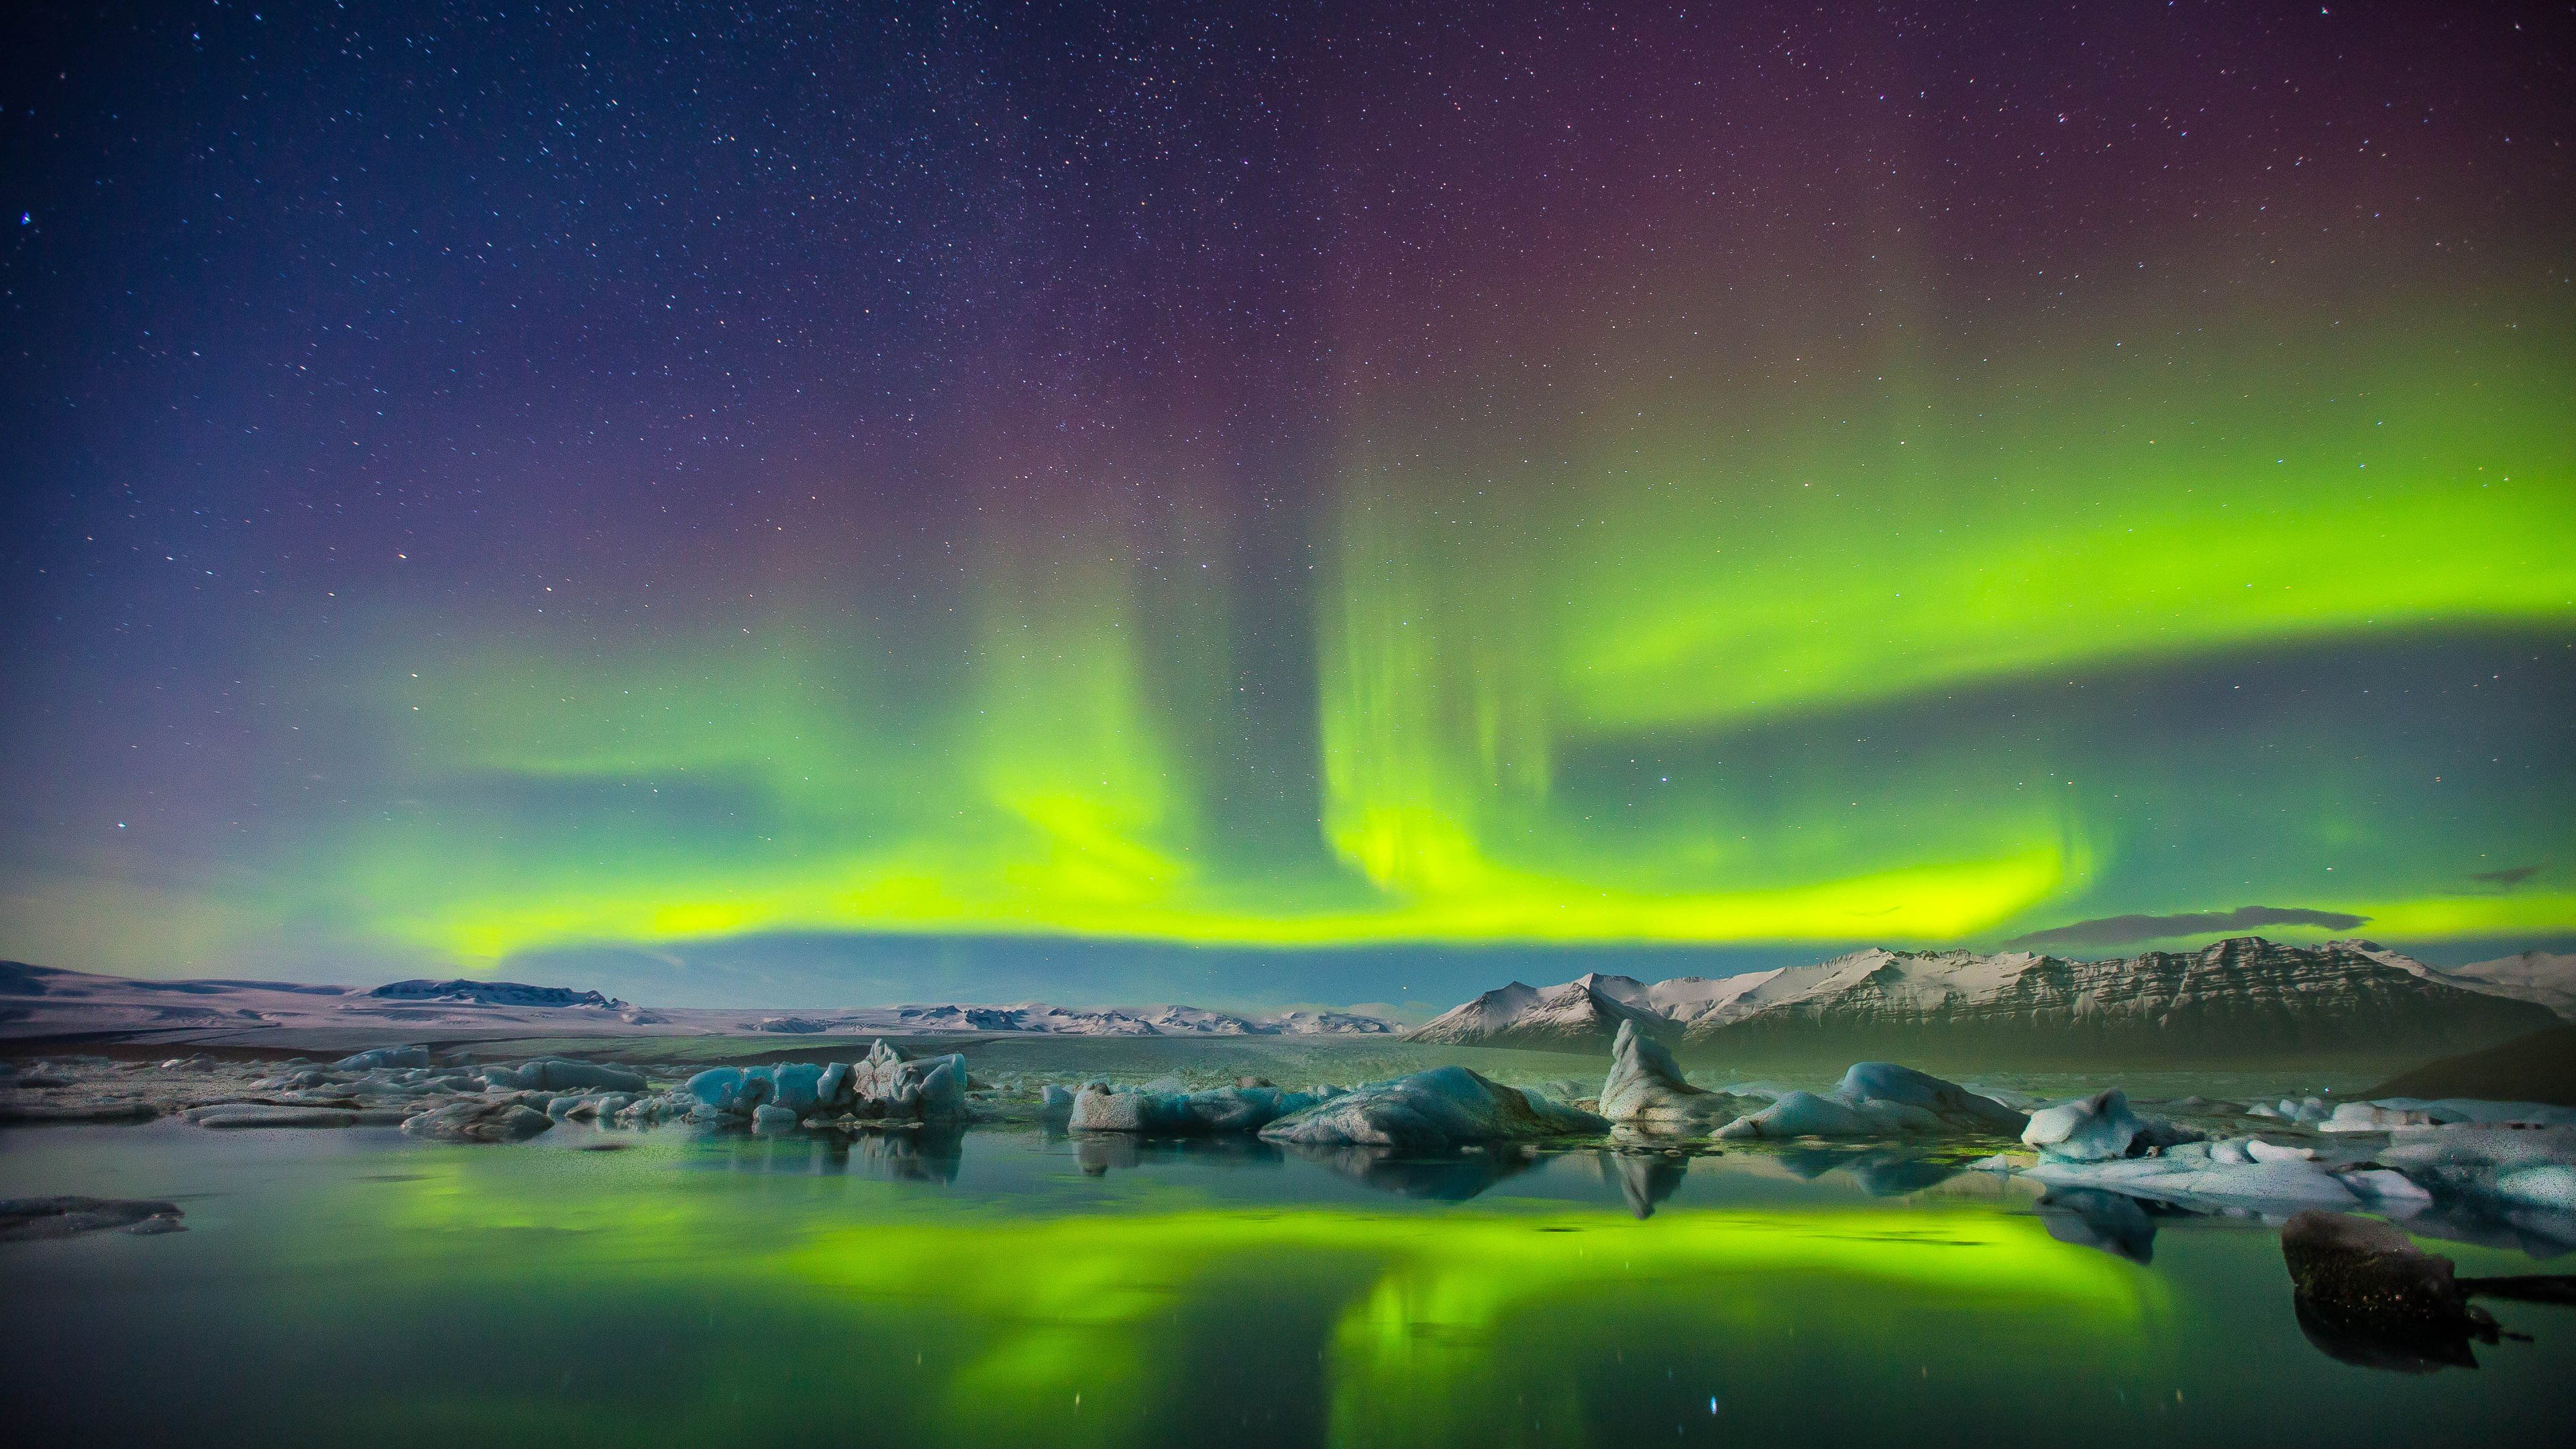 Aurora Borealis Hd Wallpapers Backgrounds Wallpaper Northern Lights Wallpaper Aurora Boreal Aurora Borealis Northern Lights